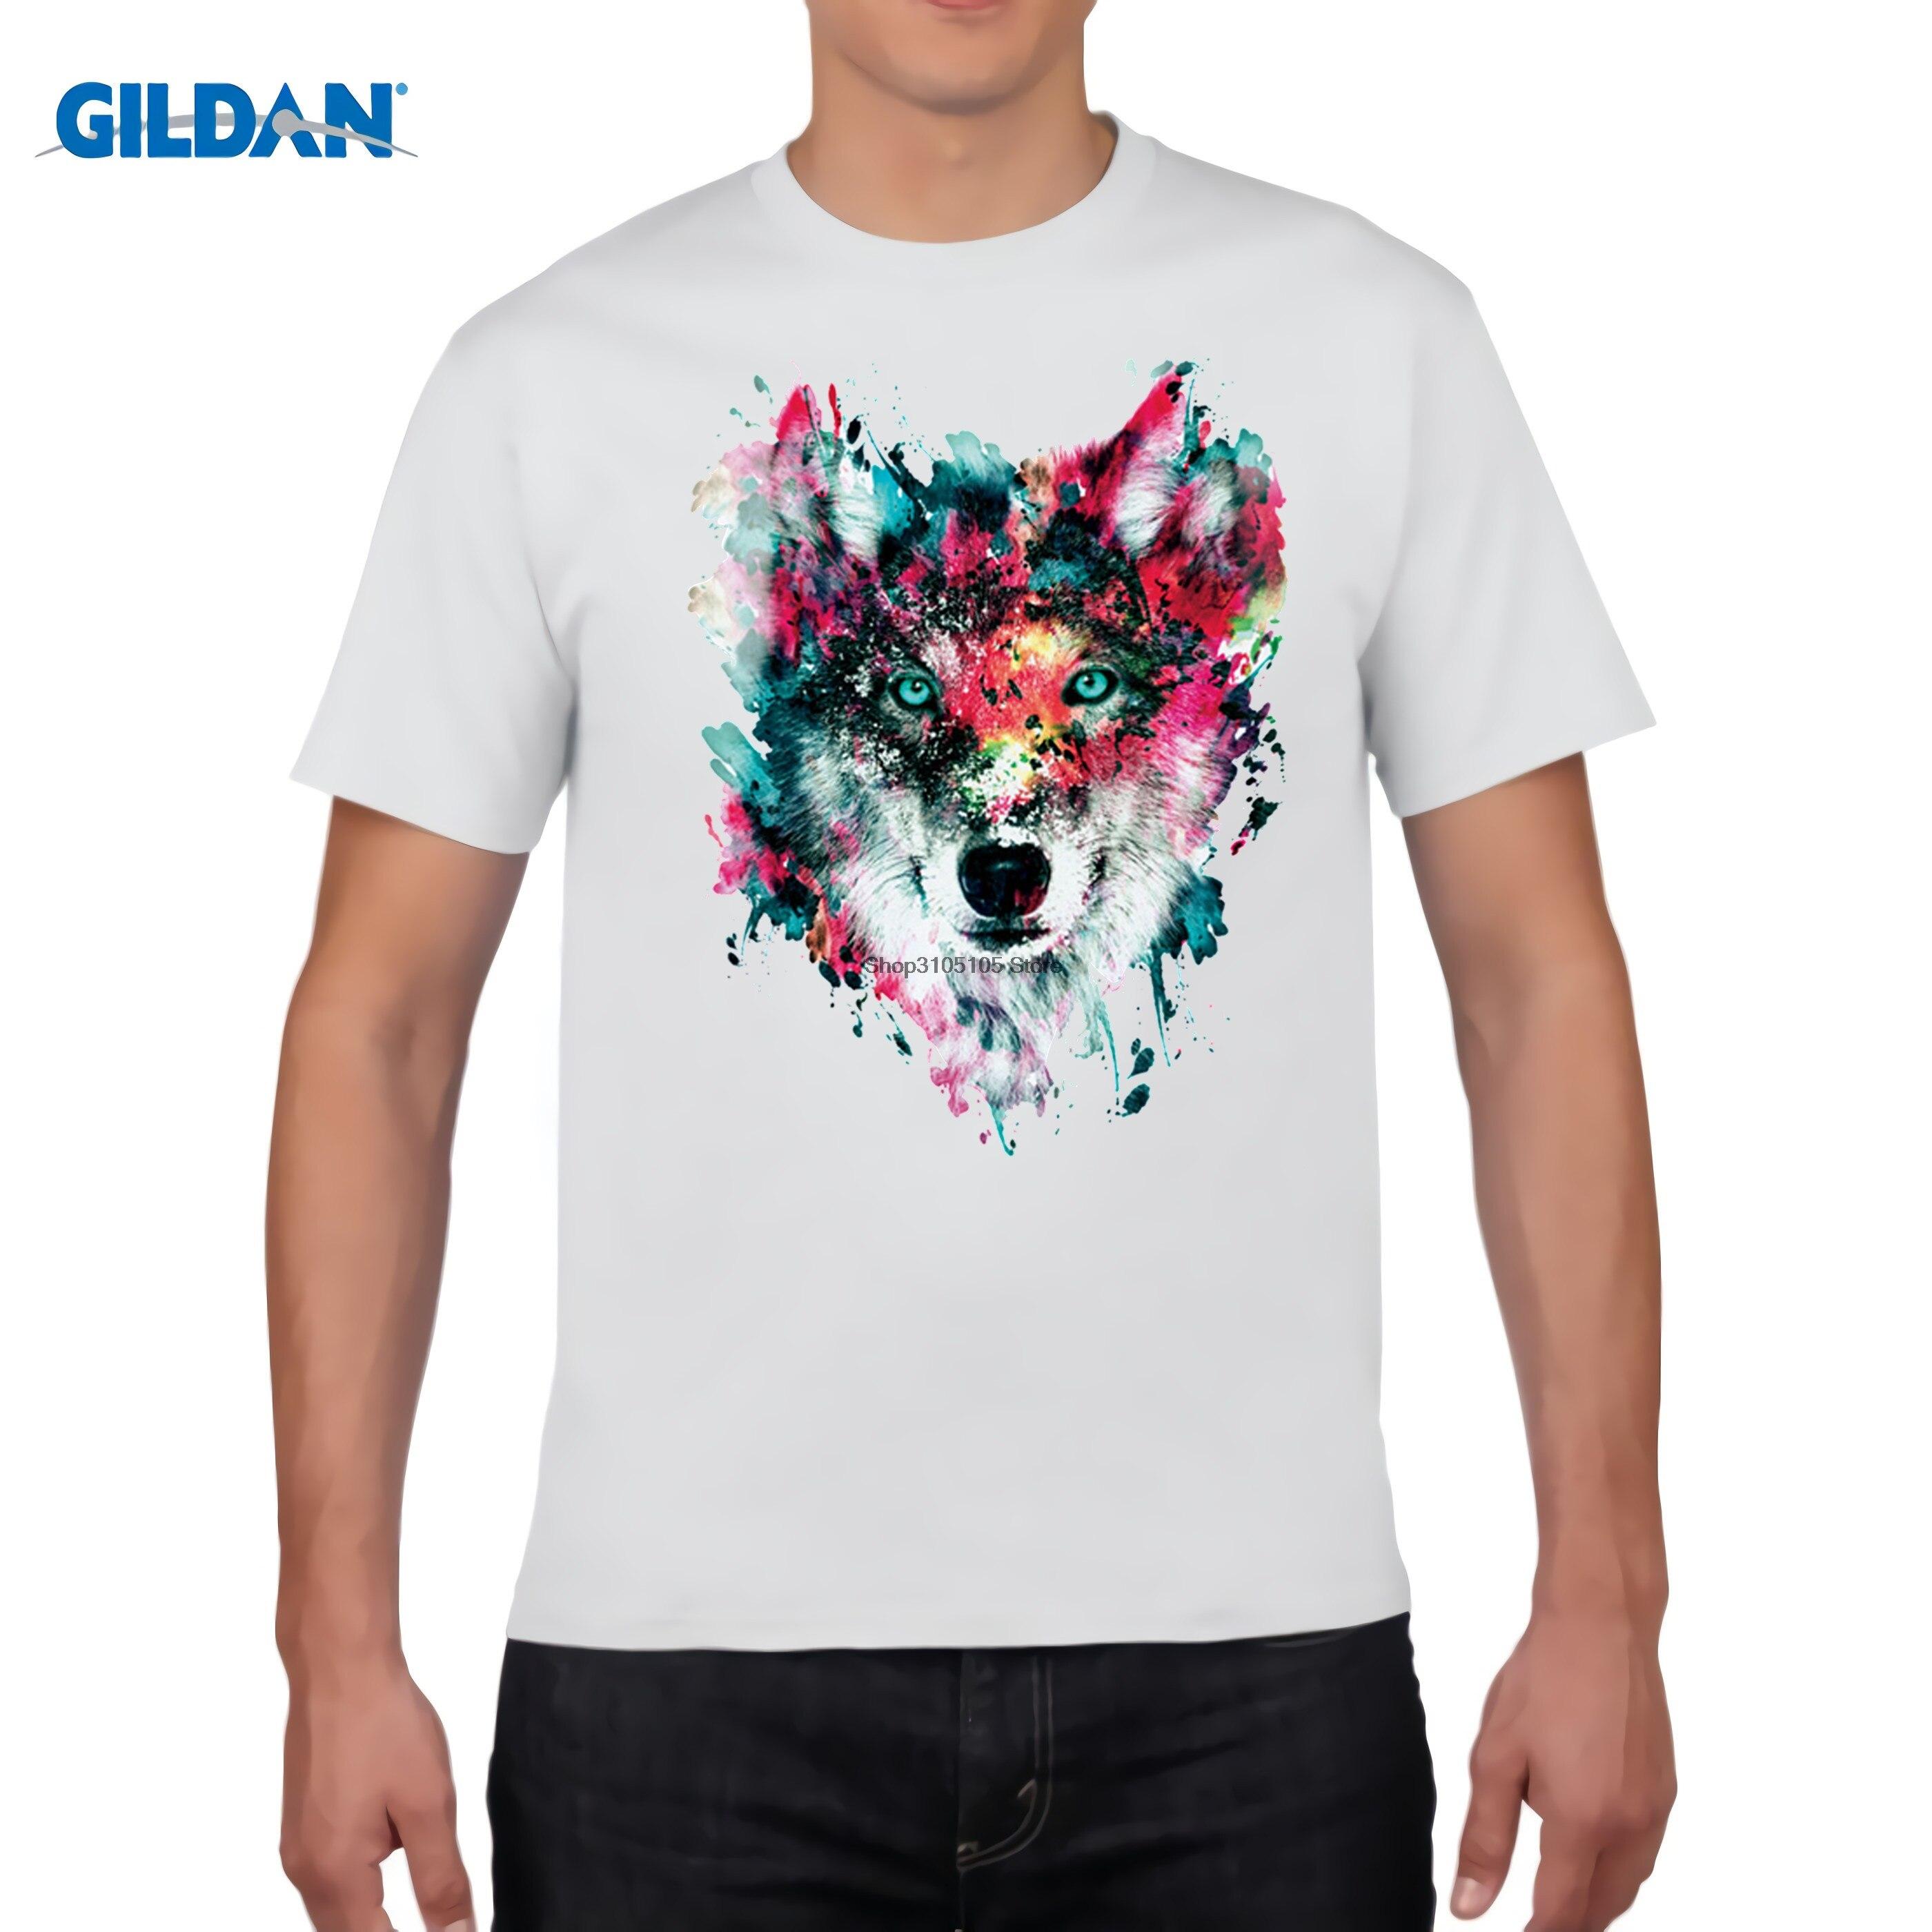 Design t shirt vistaprint - Gildan 2017 Summer Custom Owl Wolf Tiger Design T Shirt Men S Watercolor